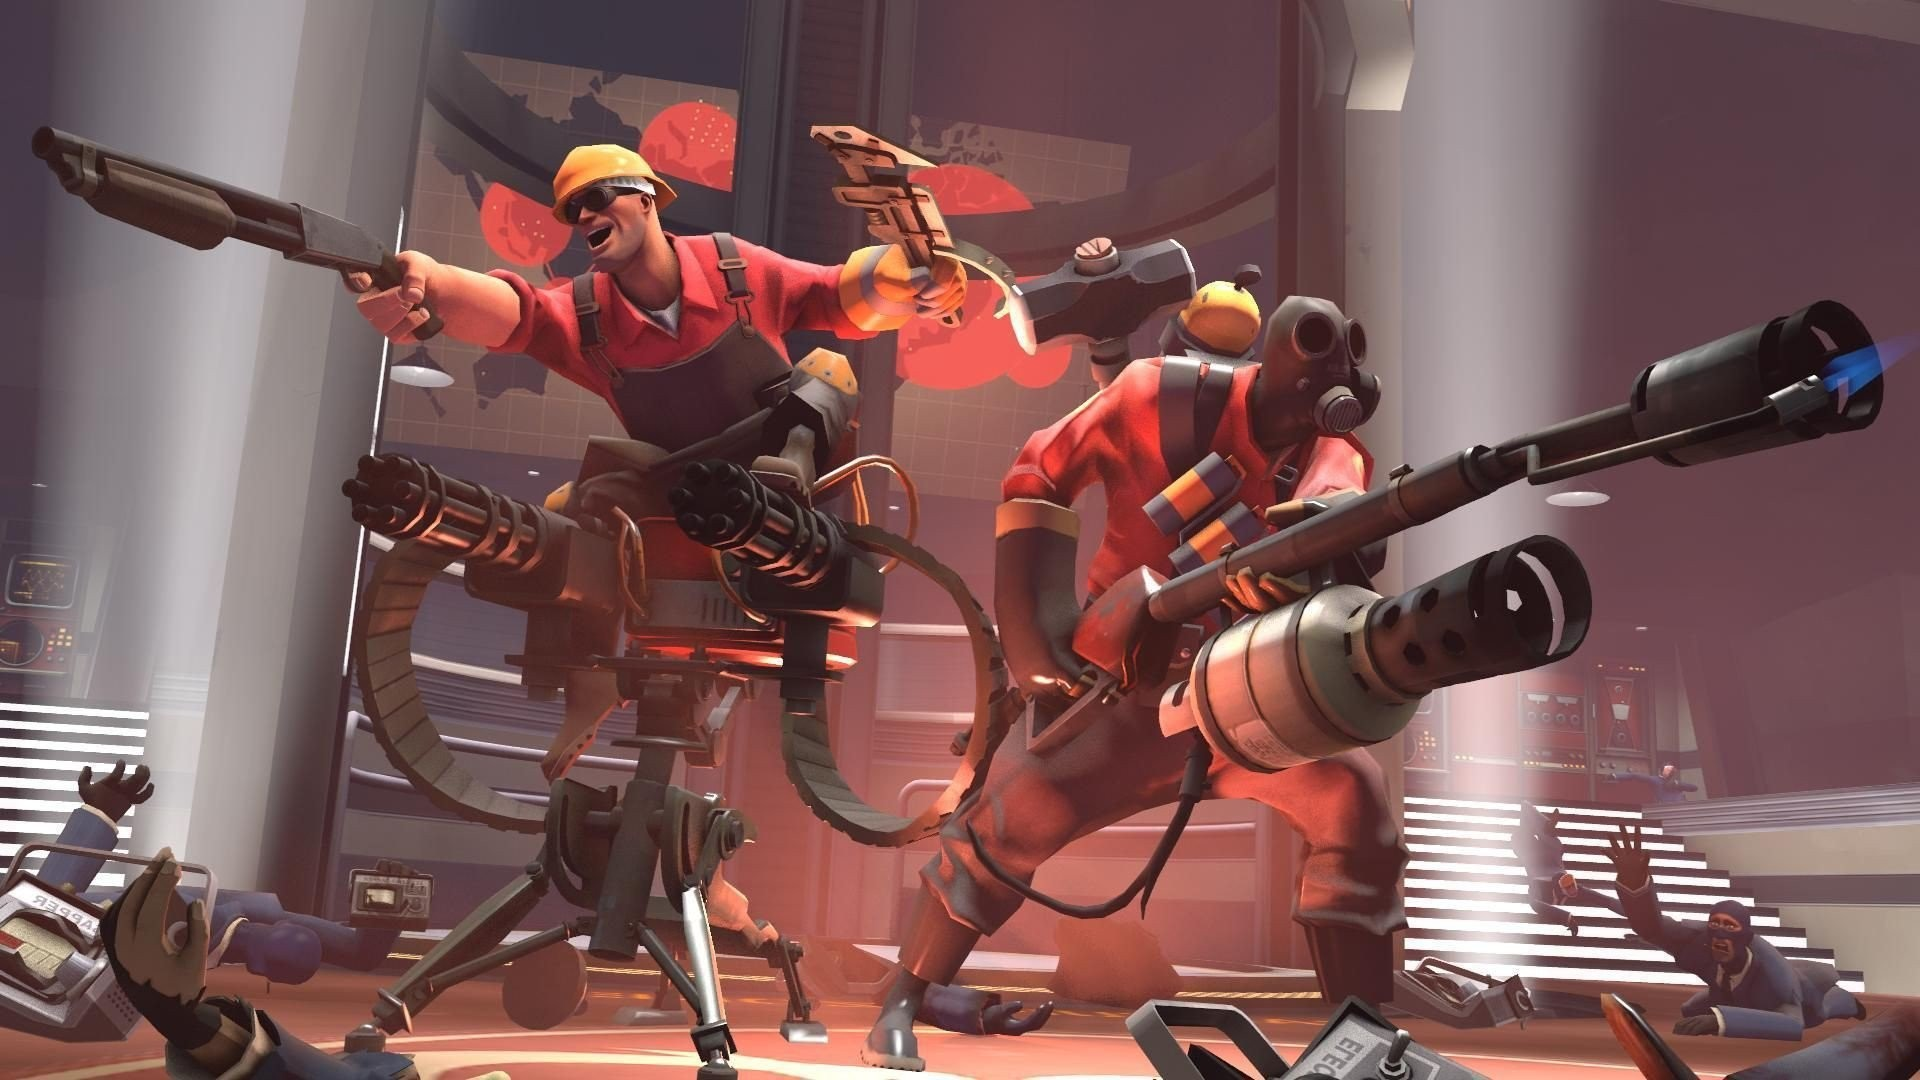 Video Games Artwork Team Fortress 2 Valve Corporation Pyro Engineer